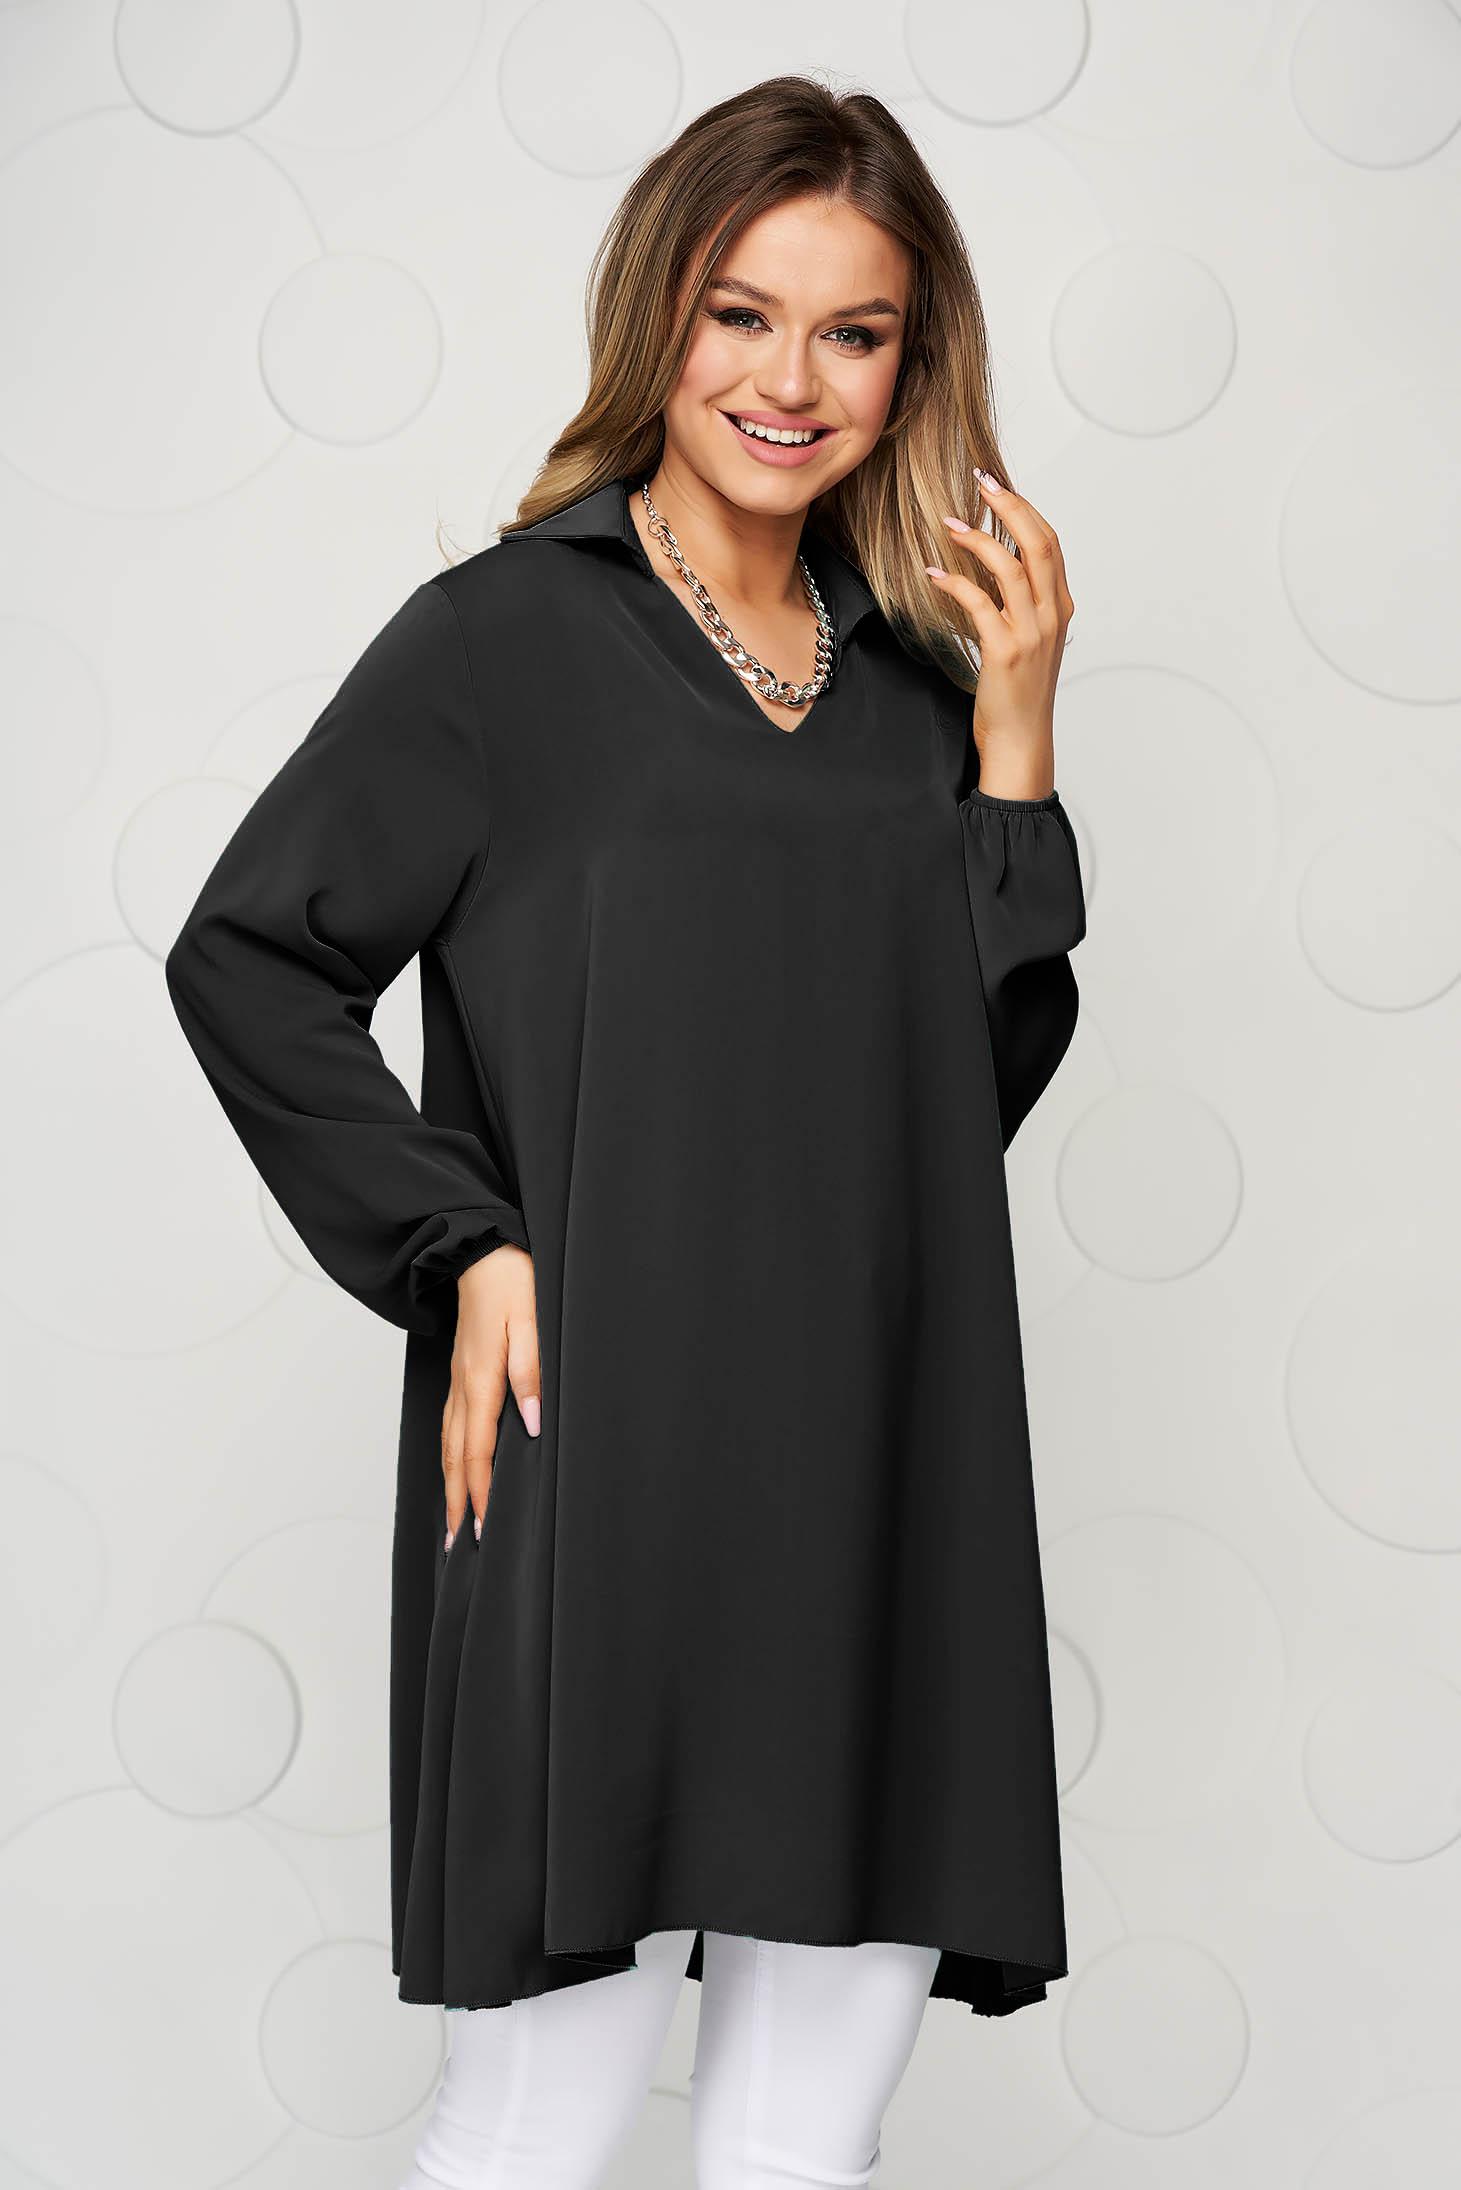 Black women`s blouse loose fit transparent chiffon fabric long sleeve